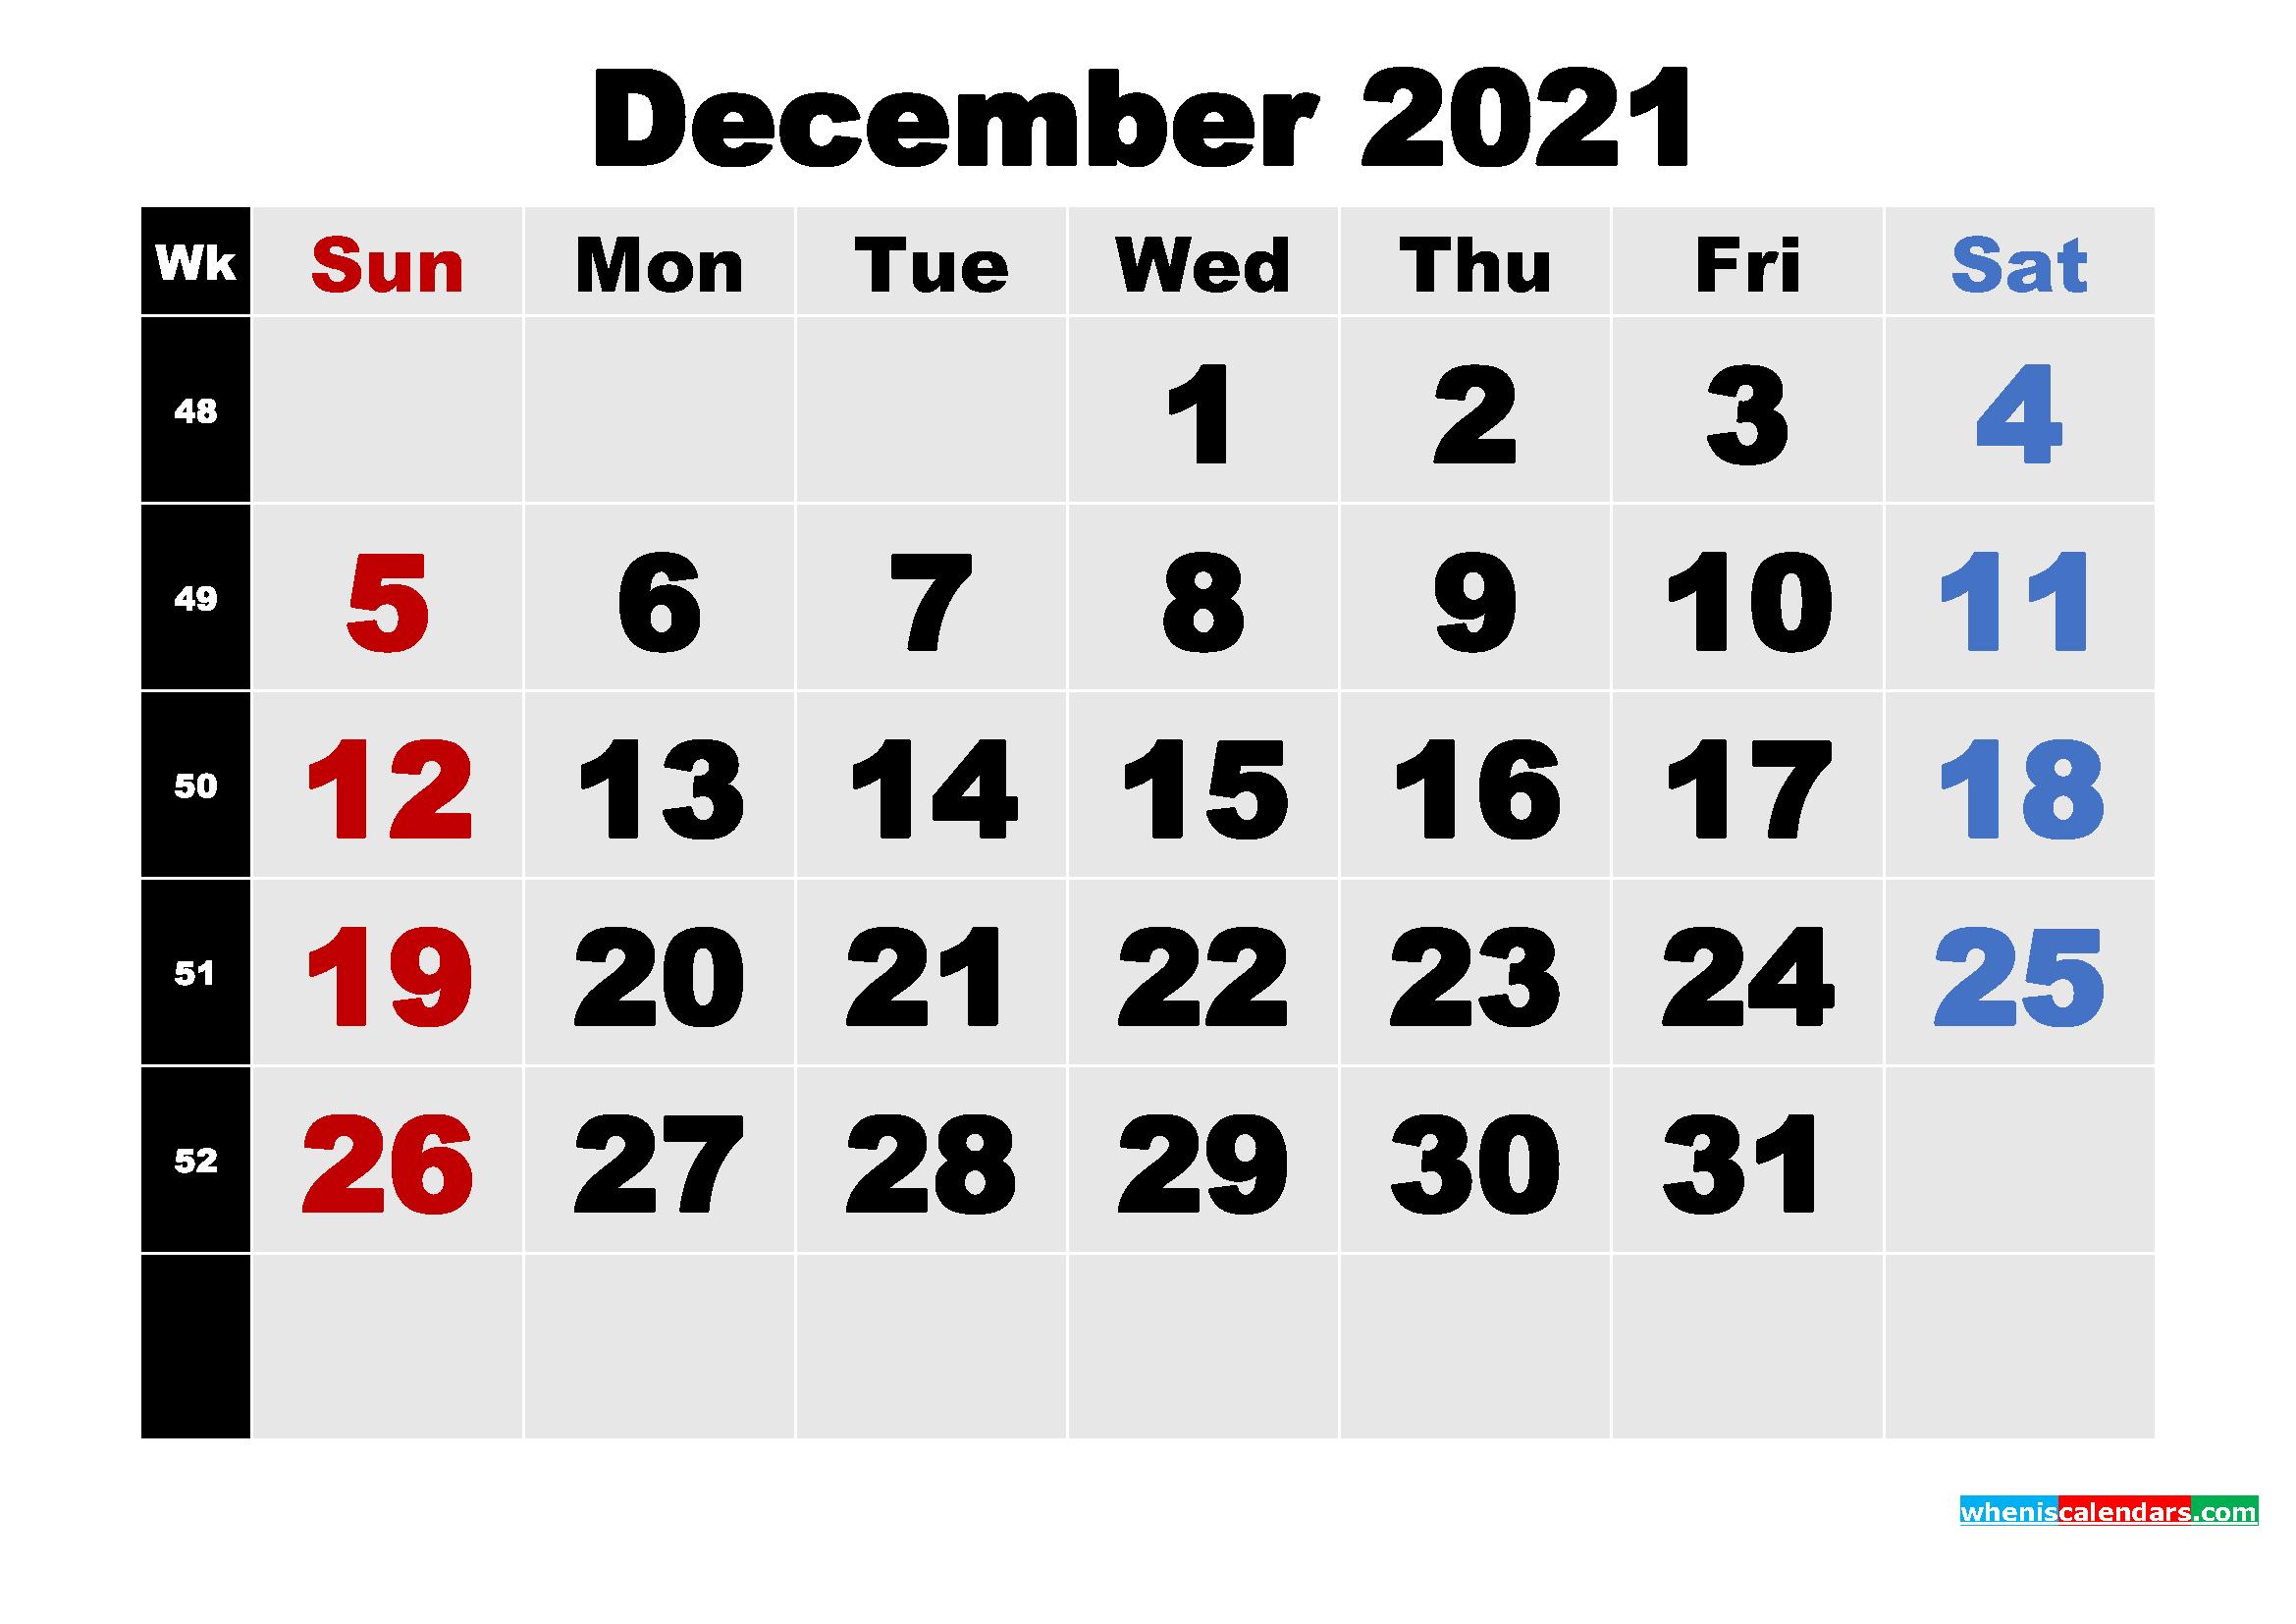 Free Printable December 2021 Calendar Template Word, Pdf - Free Printable 2020 Monthly Calendar